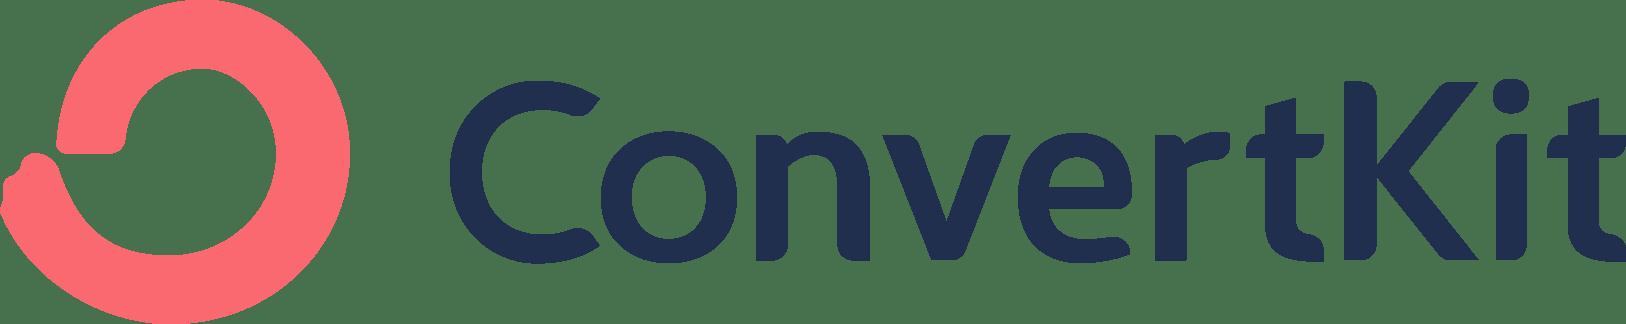 convert kit email software for entrpreneurs